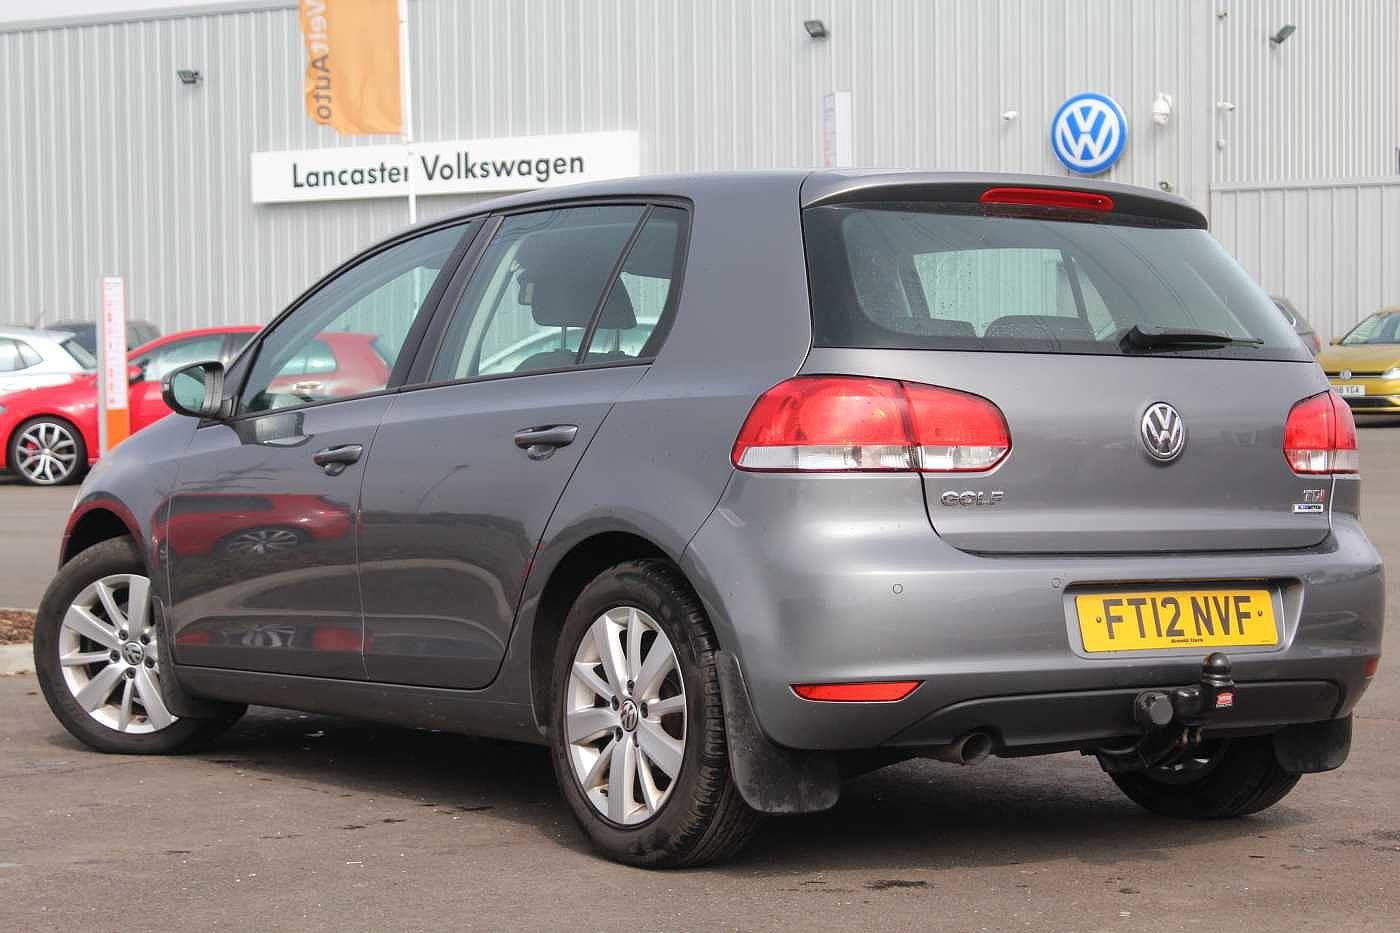 Volkswagen Golf 1.6 TDI Match 105PS DSG 5Dr